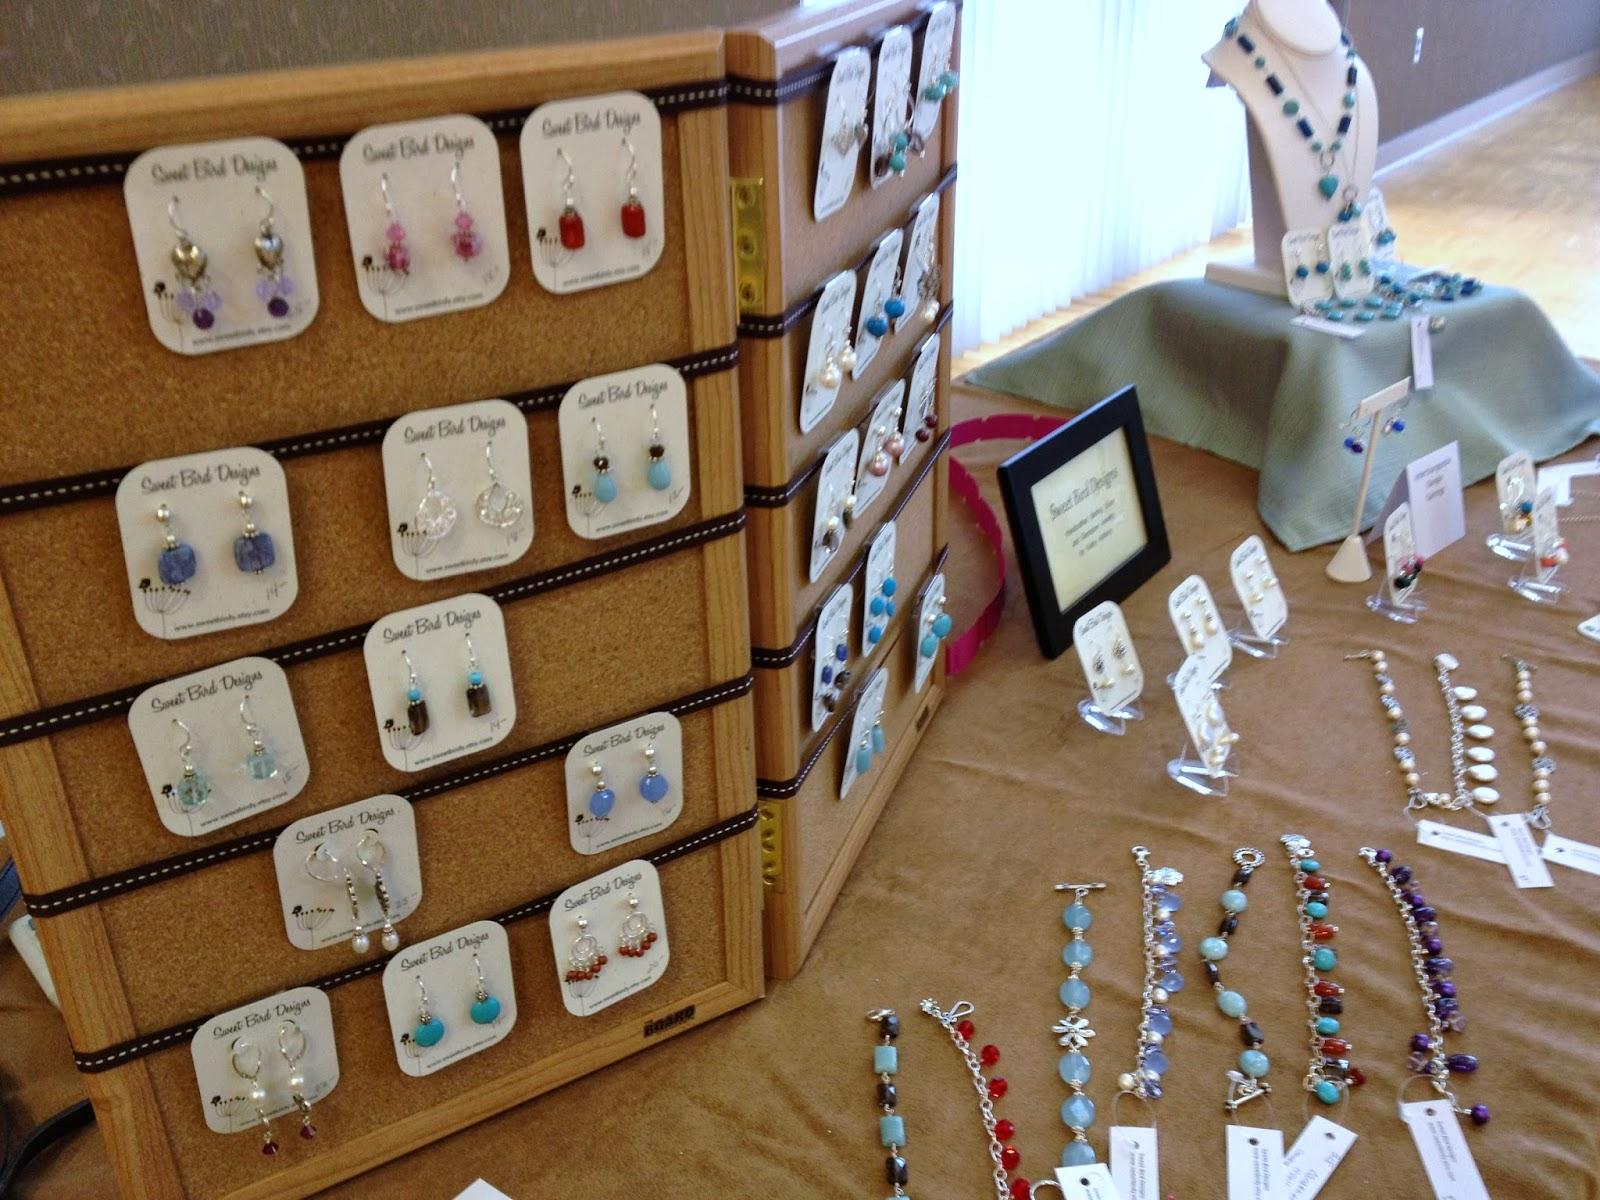 Birdy chat jewelry craft show displays for Craft show jewelry display